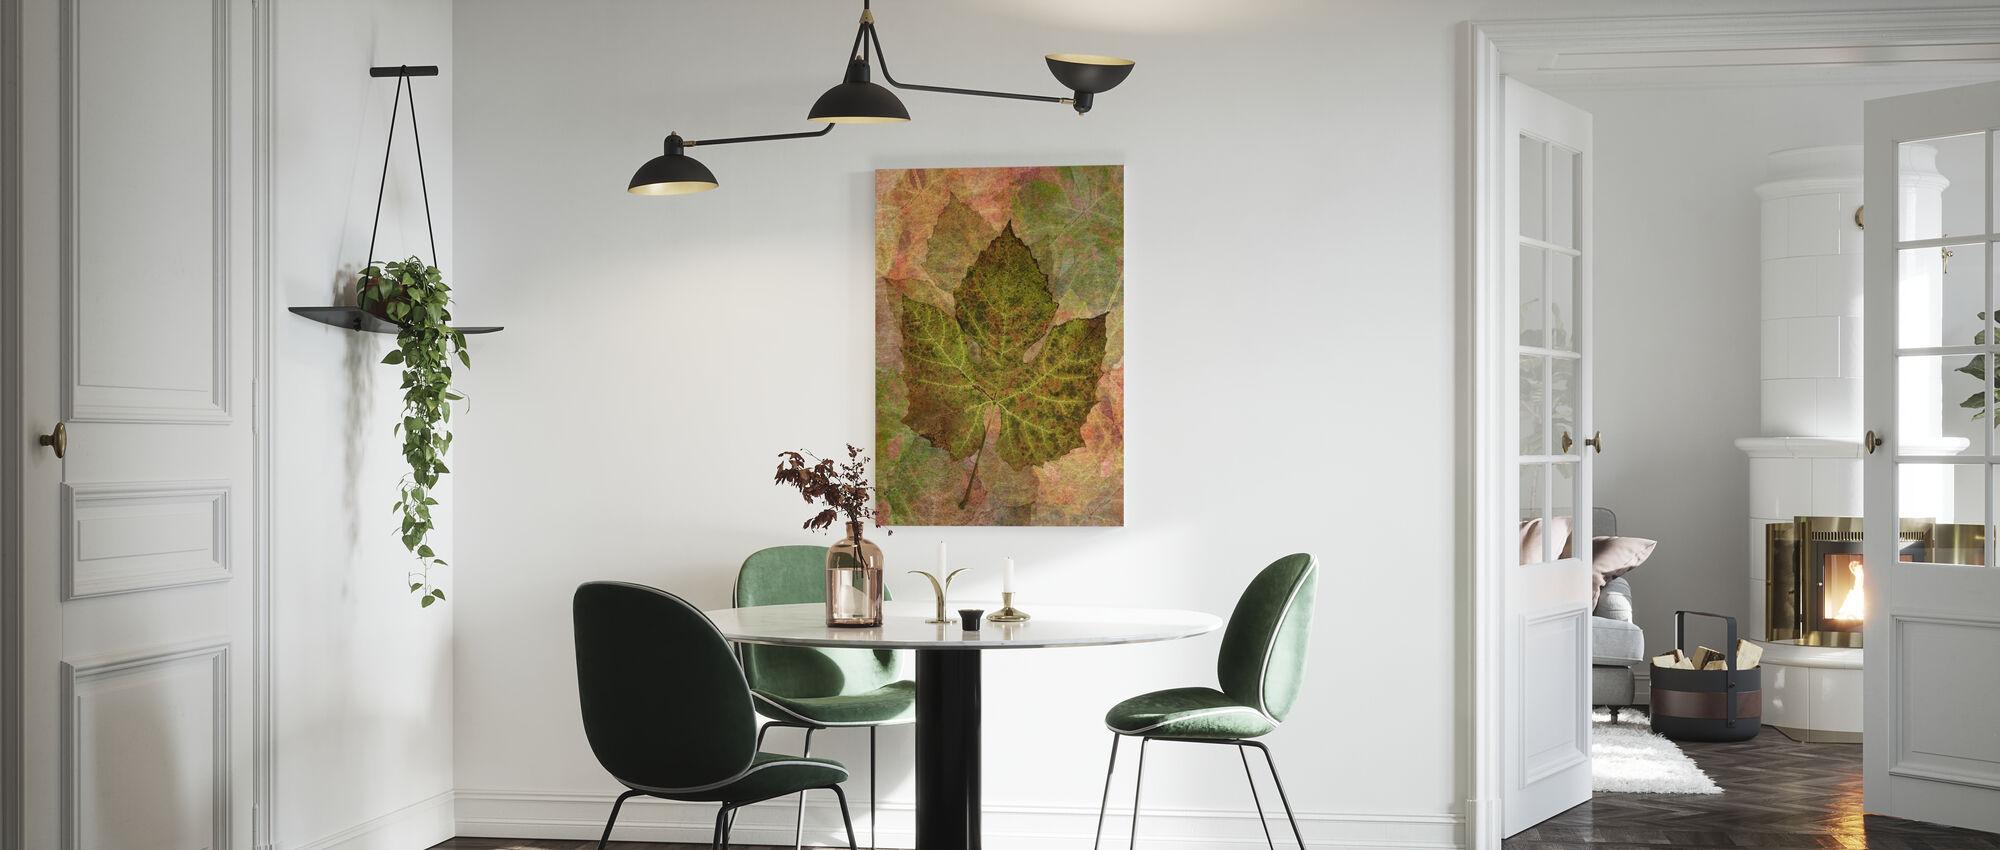 Gevallen druivenblad patroon - Canvas print - Keuken